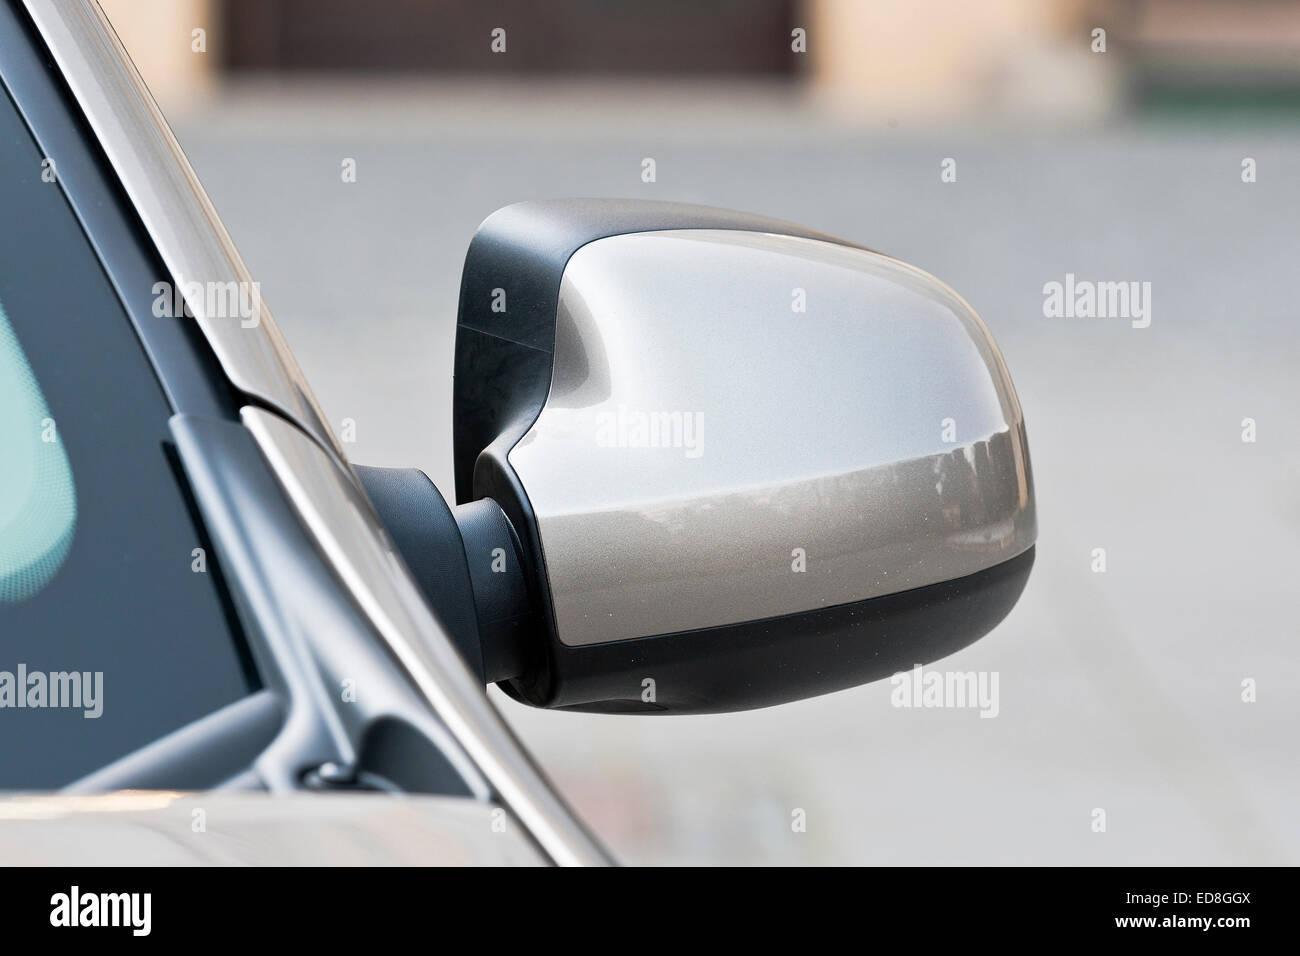 Dacia Sandero 0.9 TCe 2013. - Stock Image